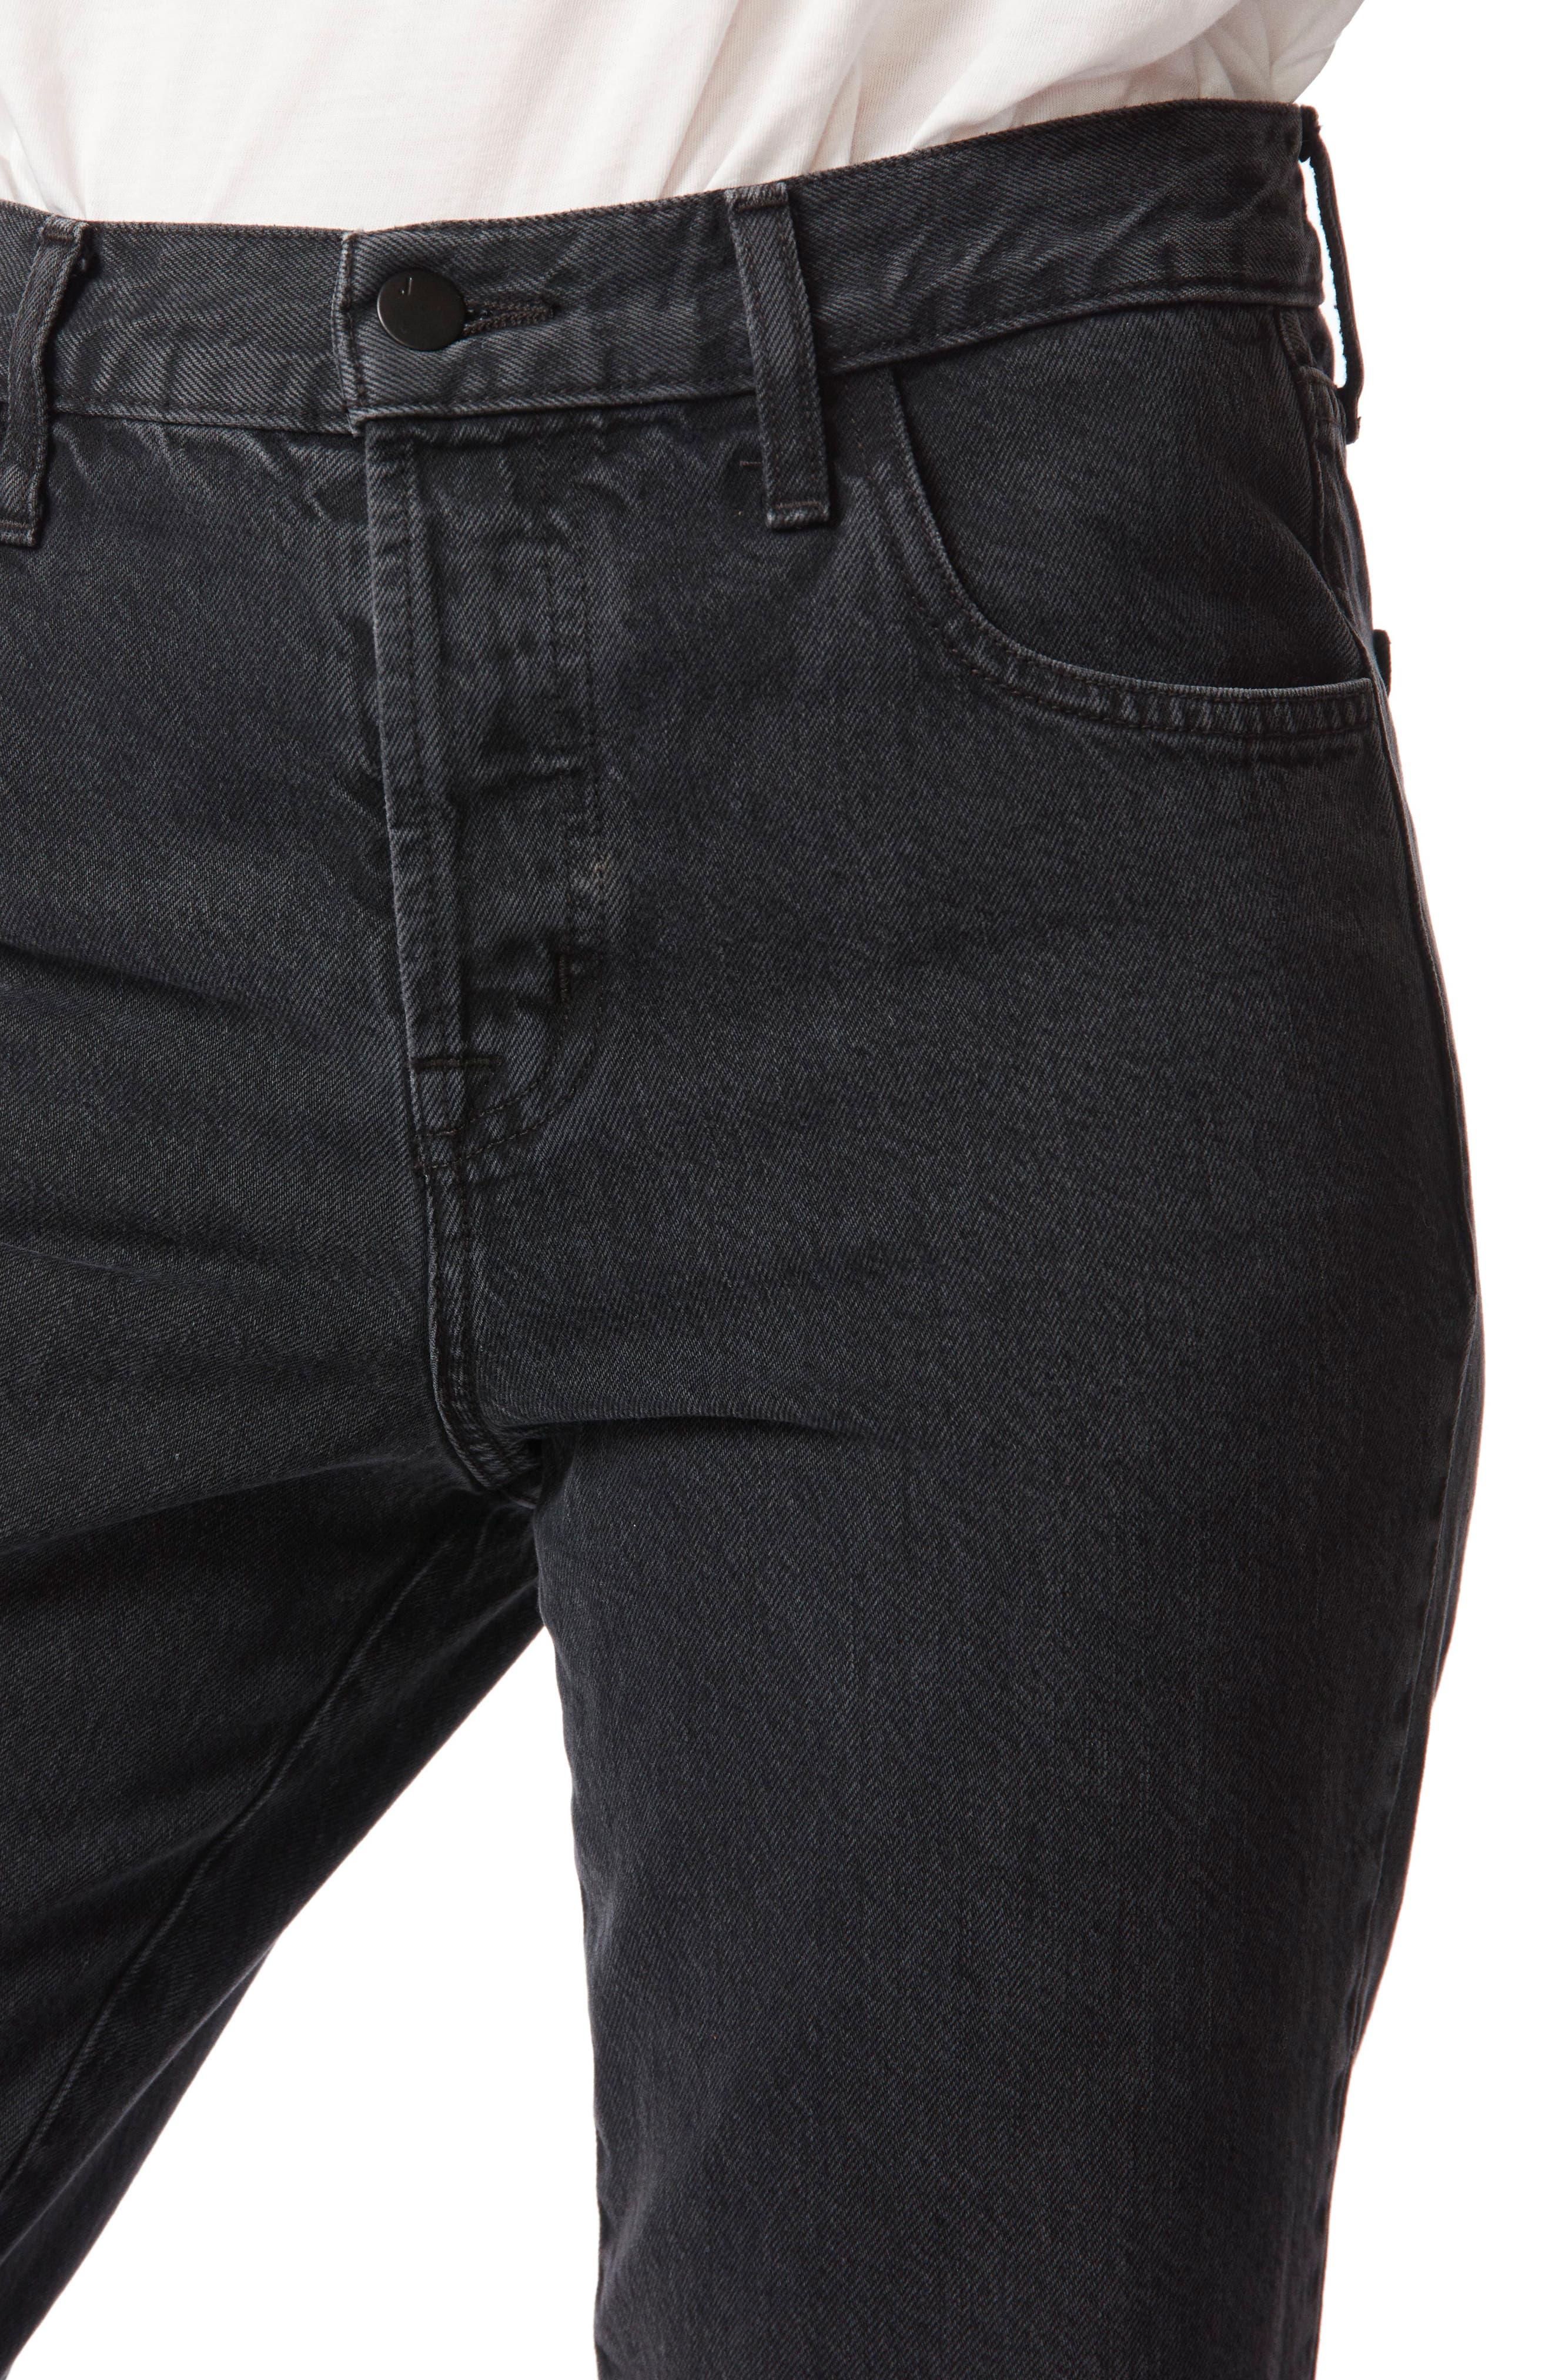 Wynne High Waist Crop Straight Leg Jeans,                             Alternate thumbnail 5, color,                             001